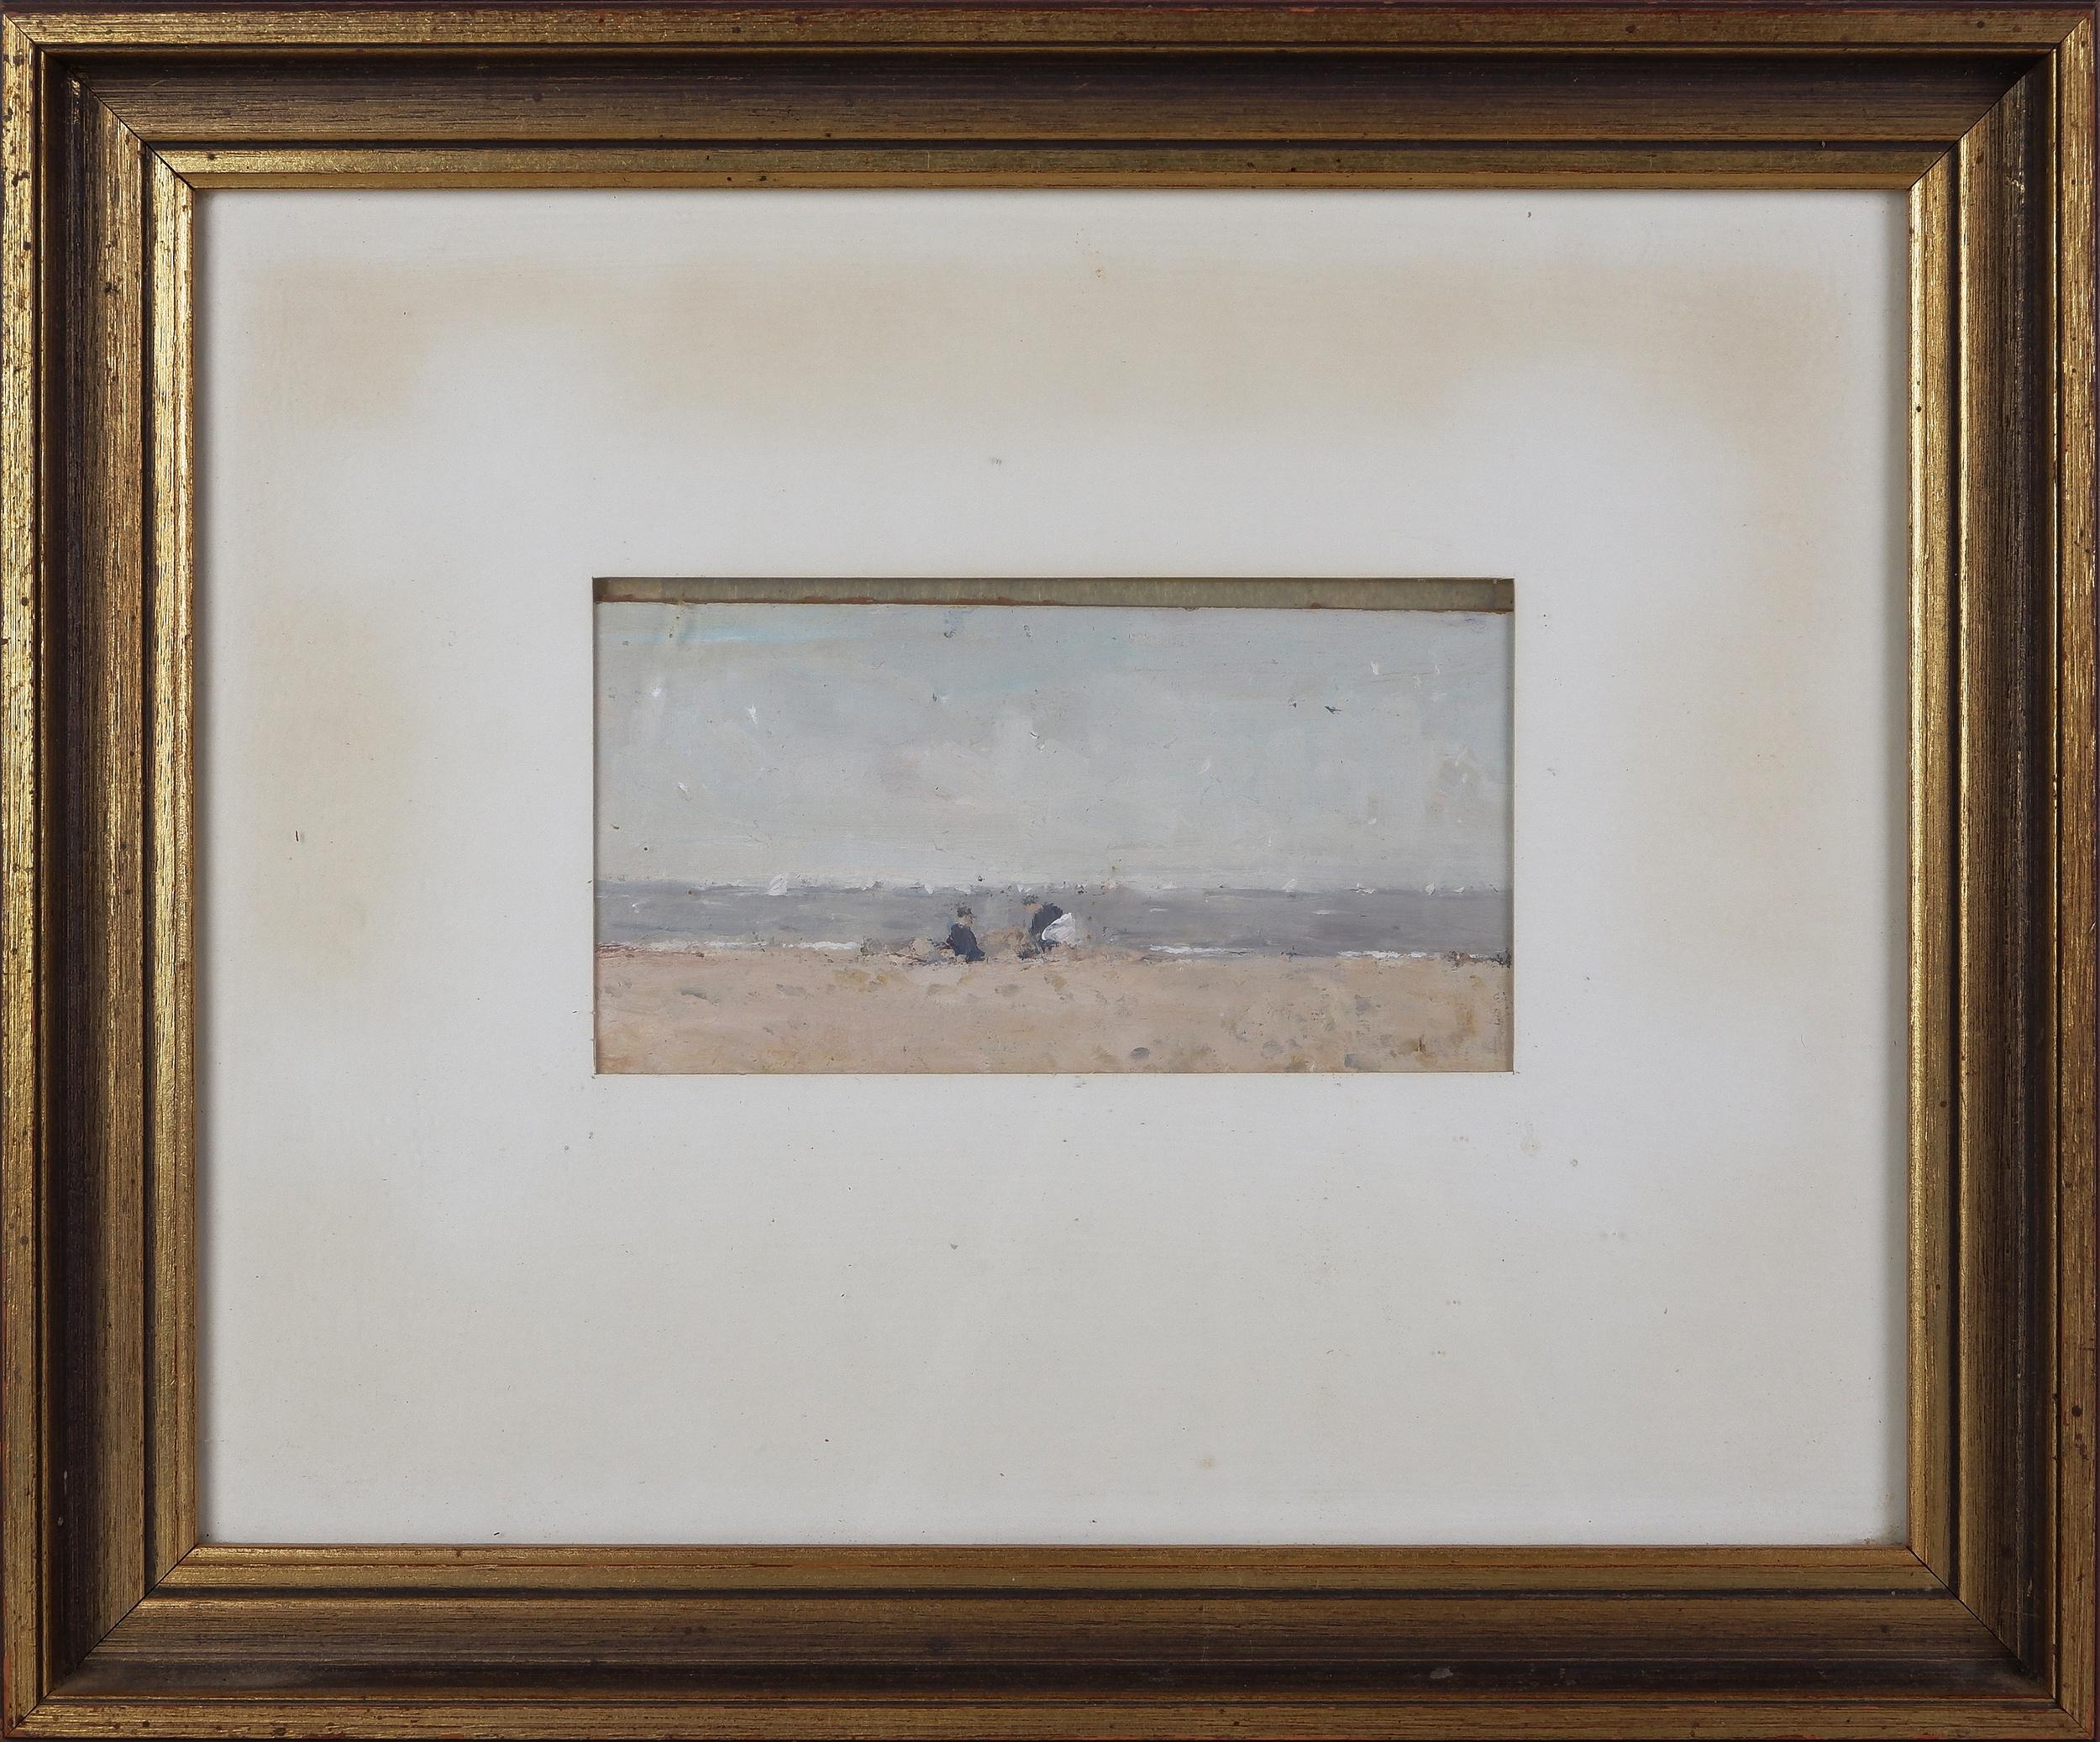 'John McQualter (born 1949), Building Sandcastles, Portsea, Oil on Board'